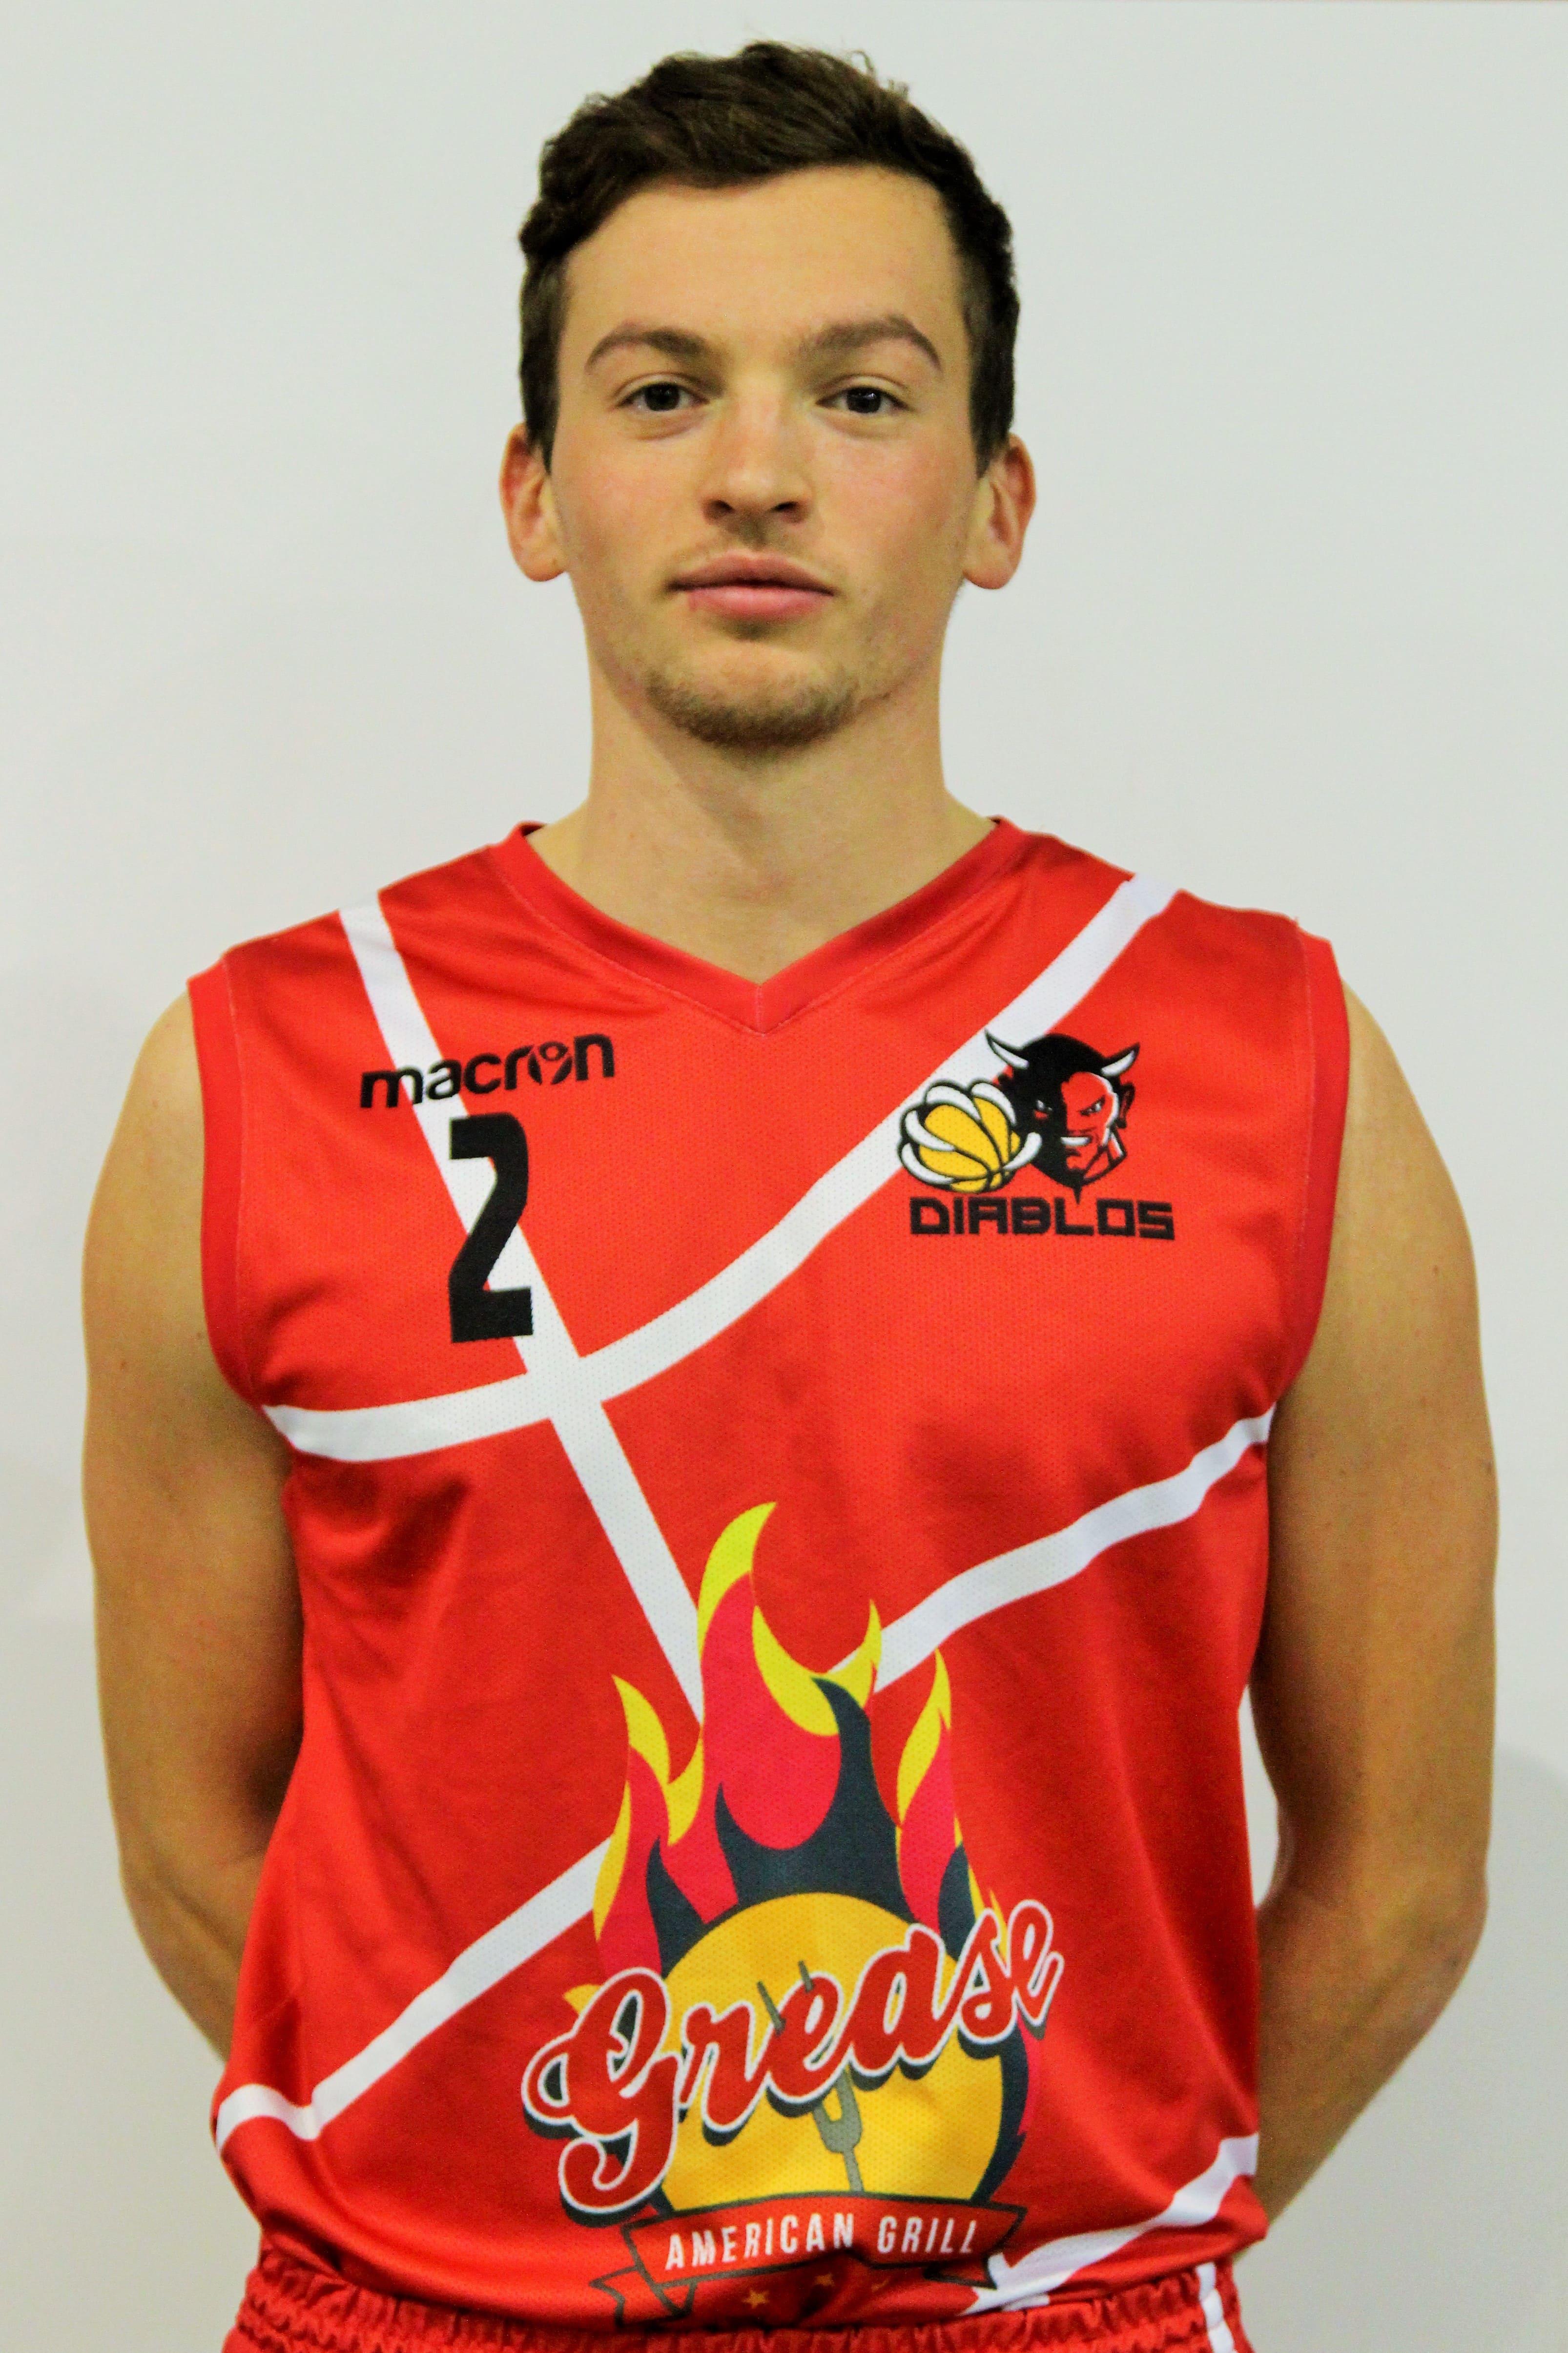 Davide Moruzzi